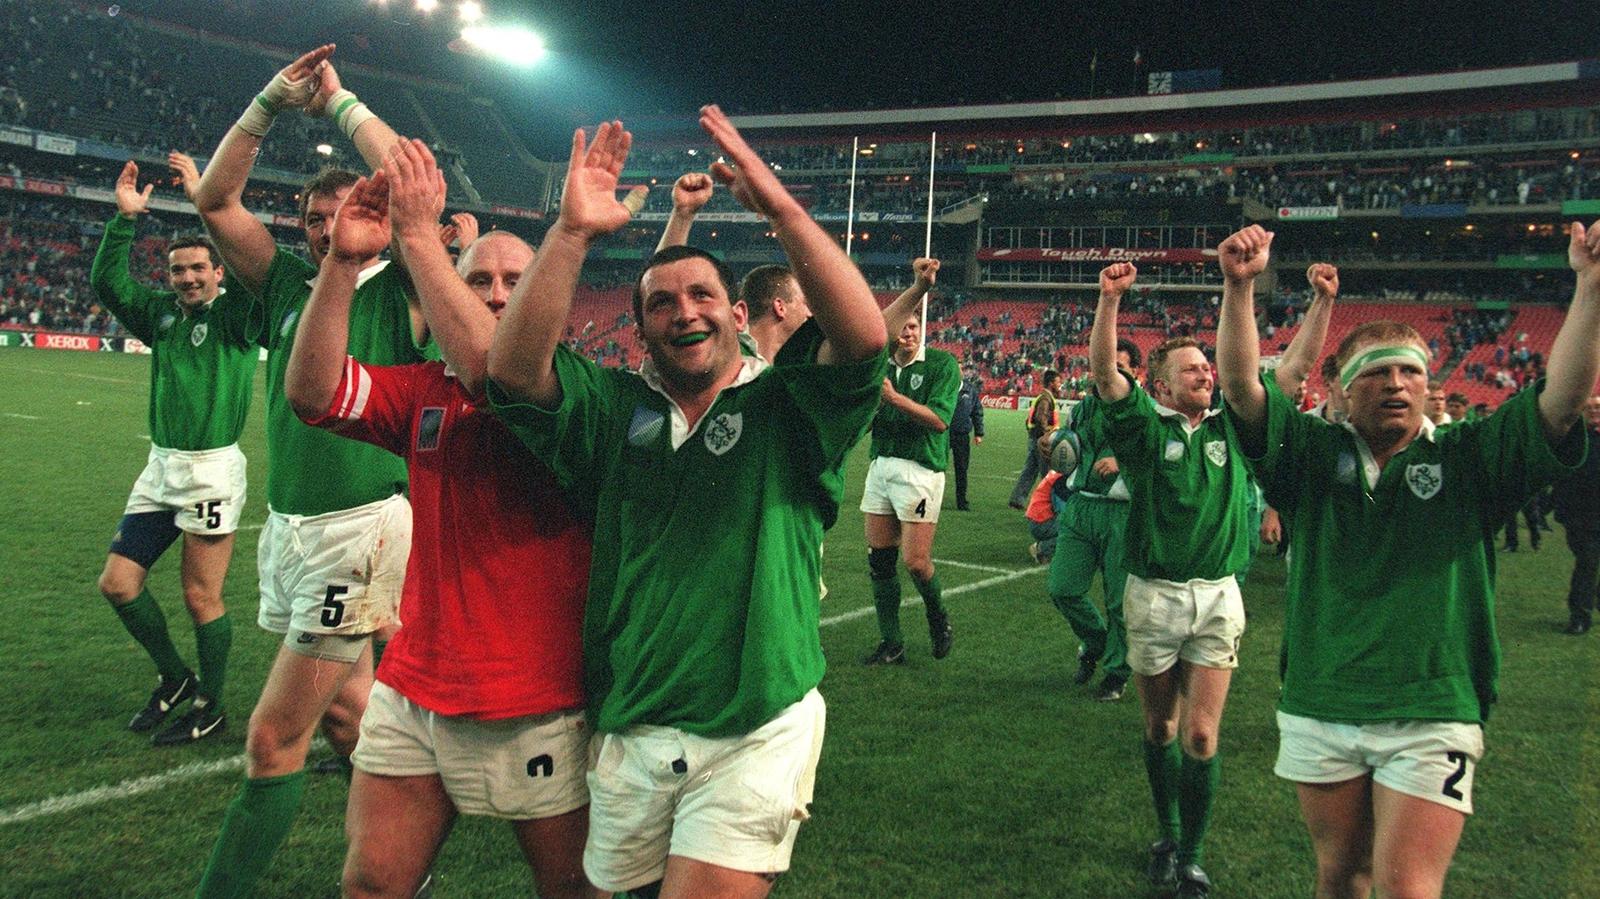 RWC Blog: Ireland sneak Wales win at RWC 1995